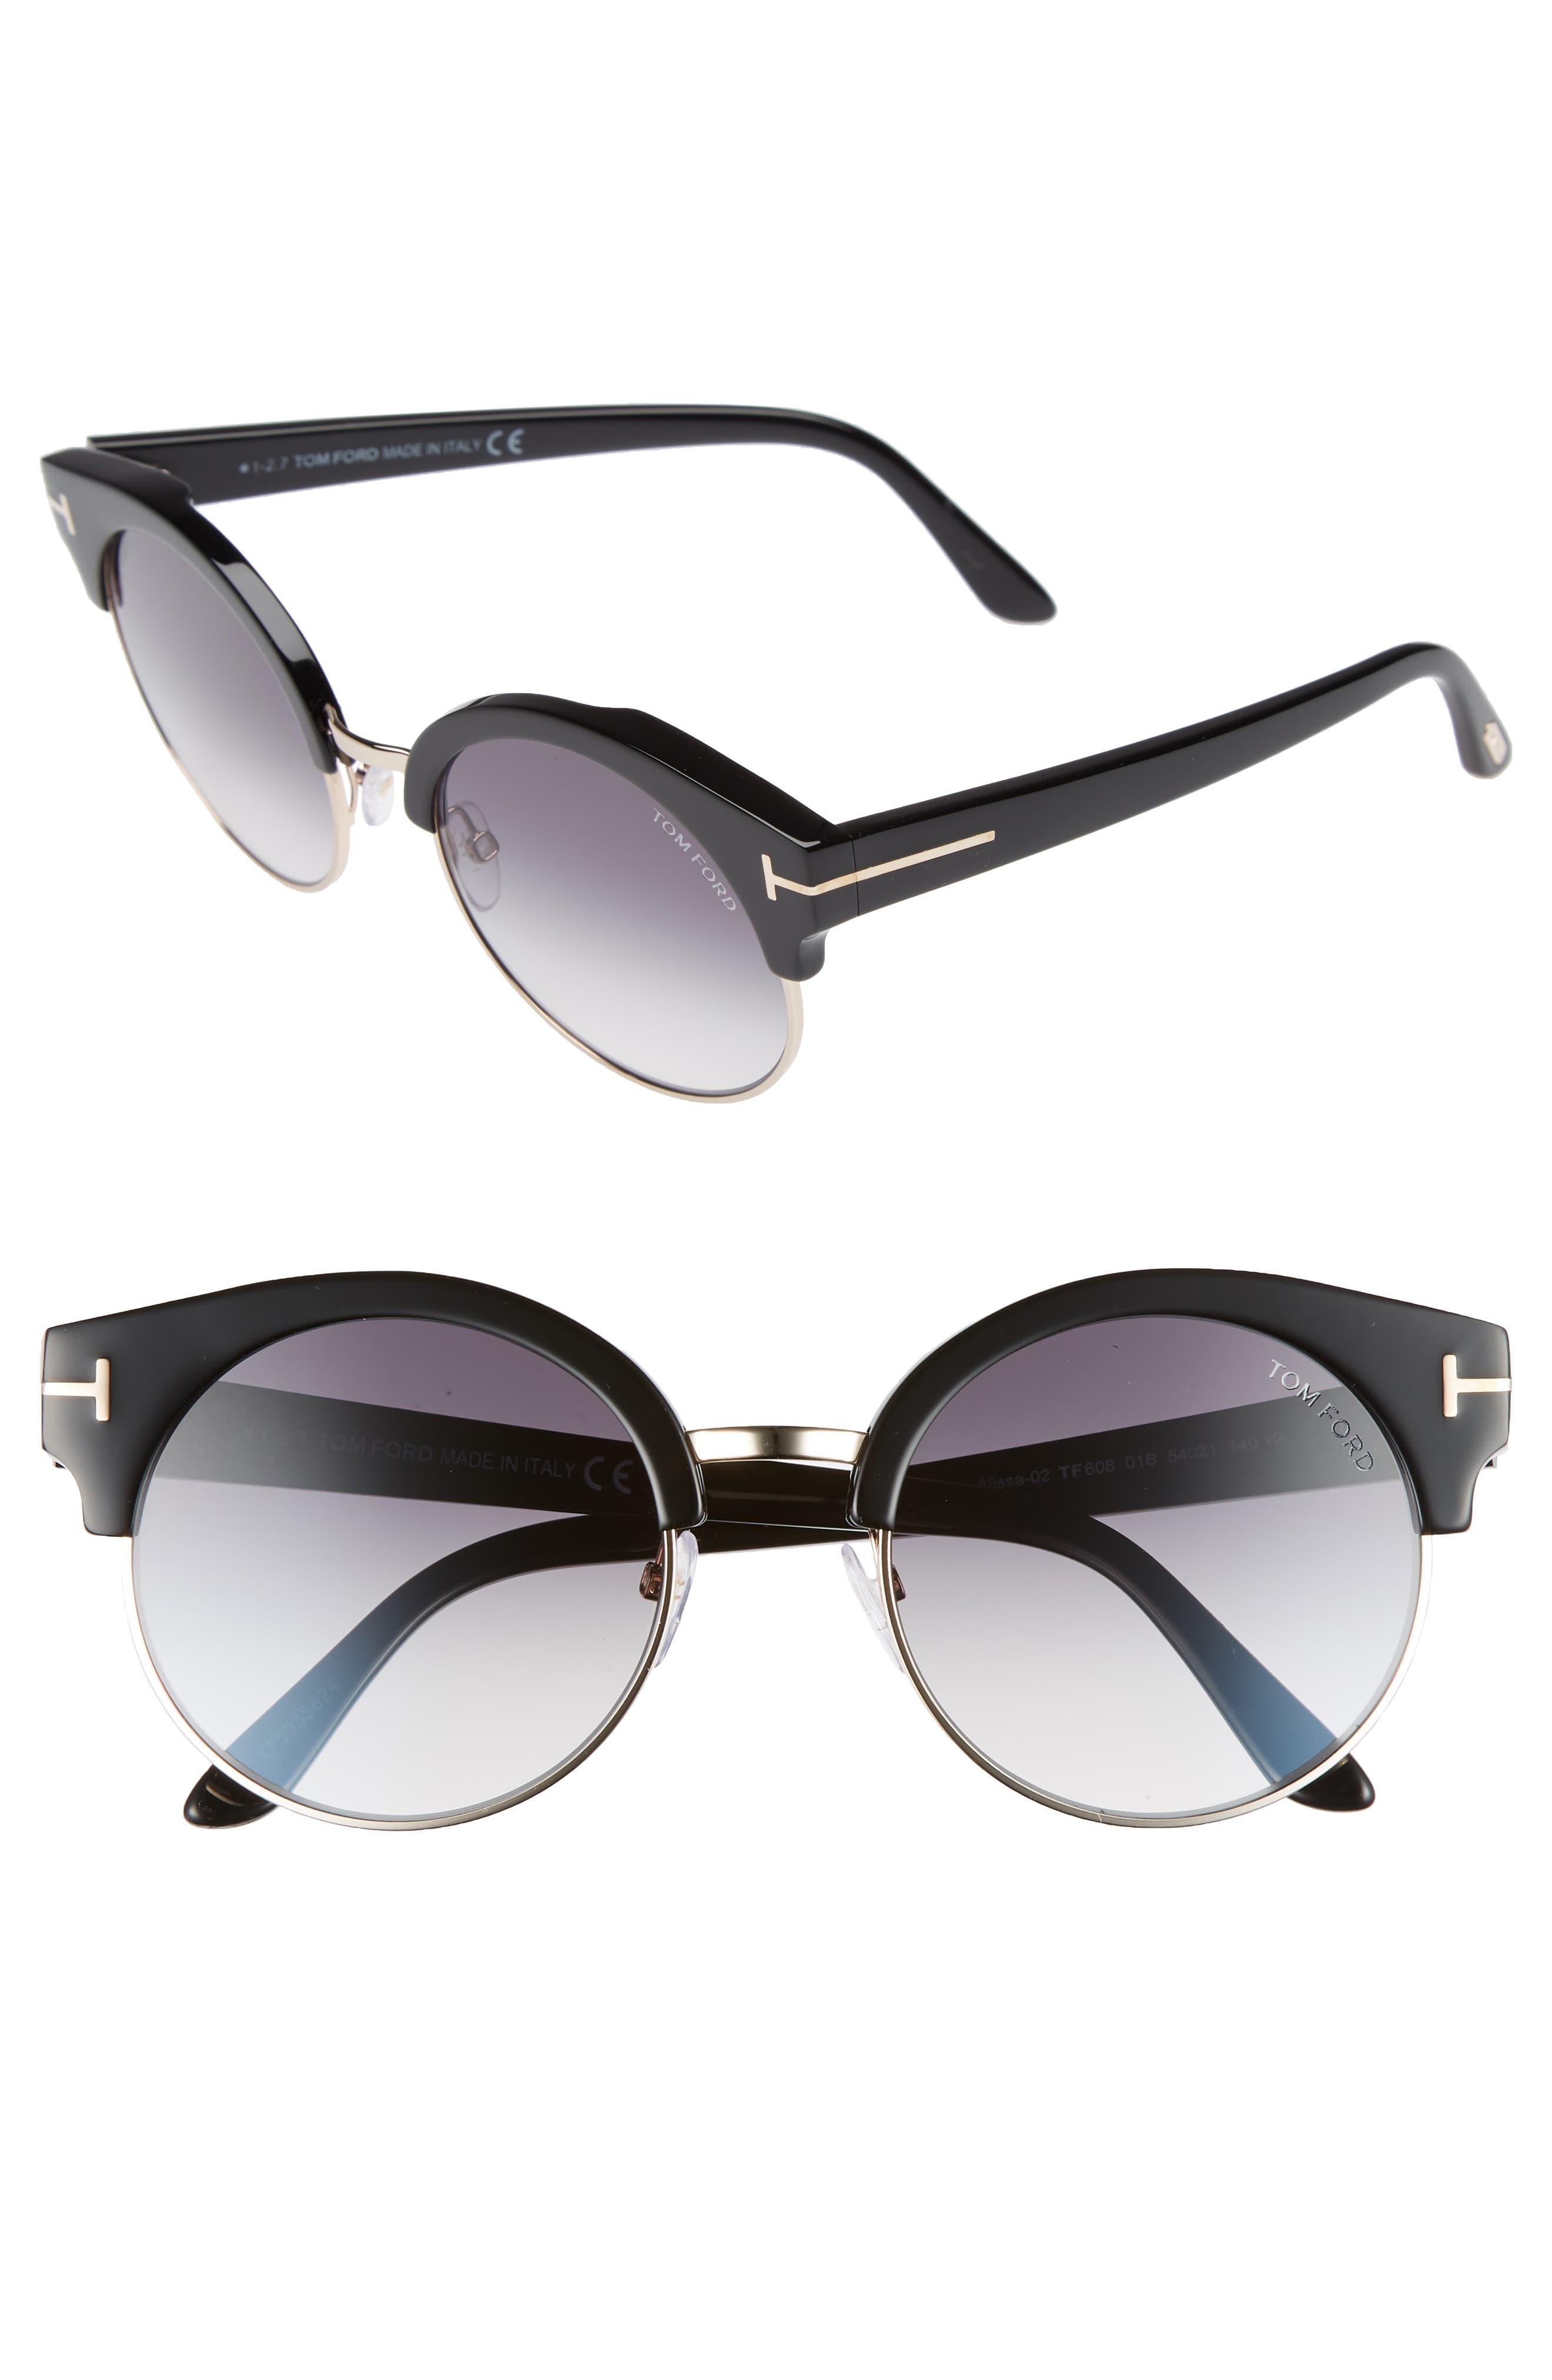 Tom Ford Alissa 54mm Sunglasses